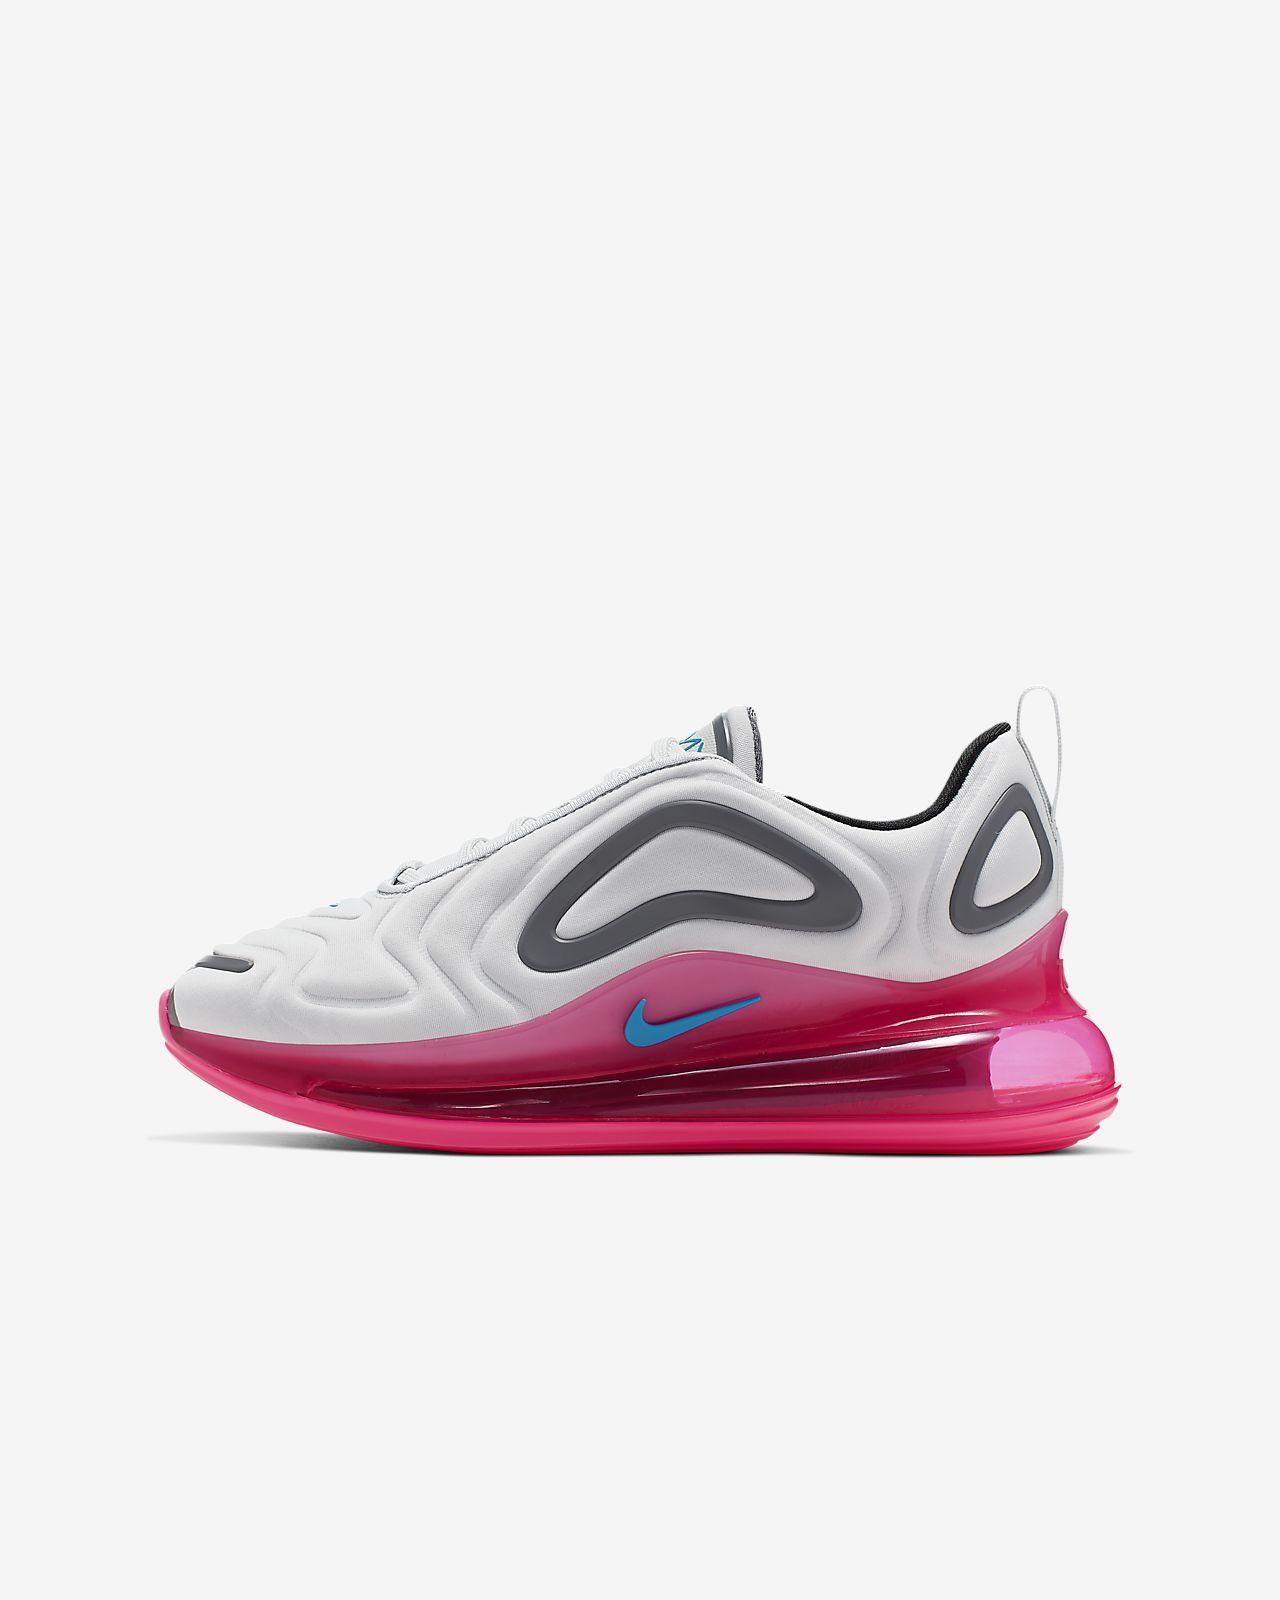 Calzado para niños talla pequeña/grande Nike Air Max 720 Game Change